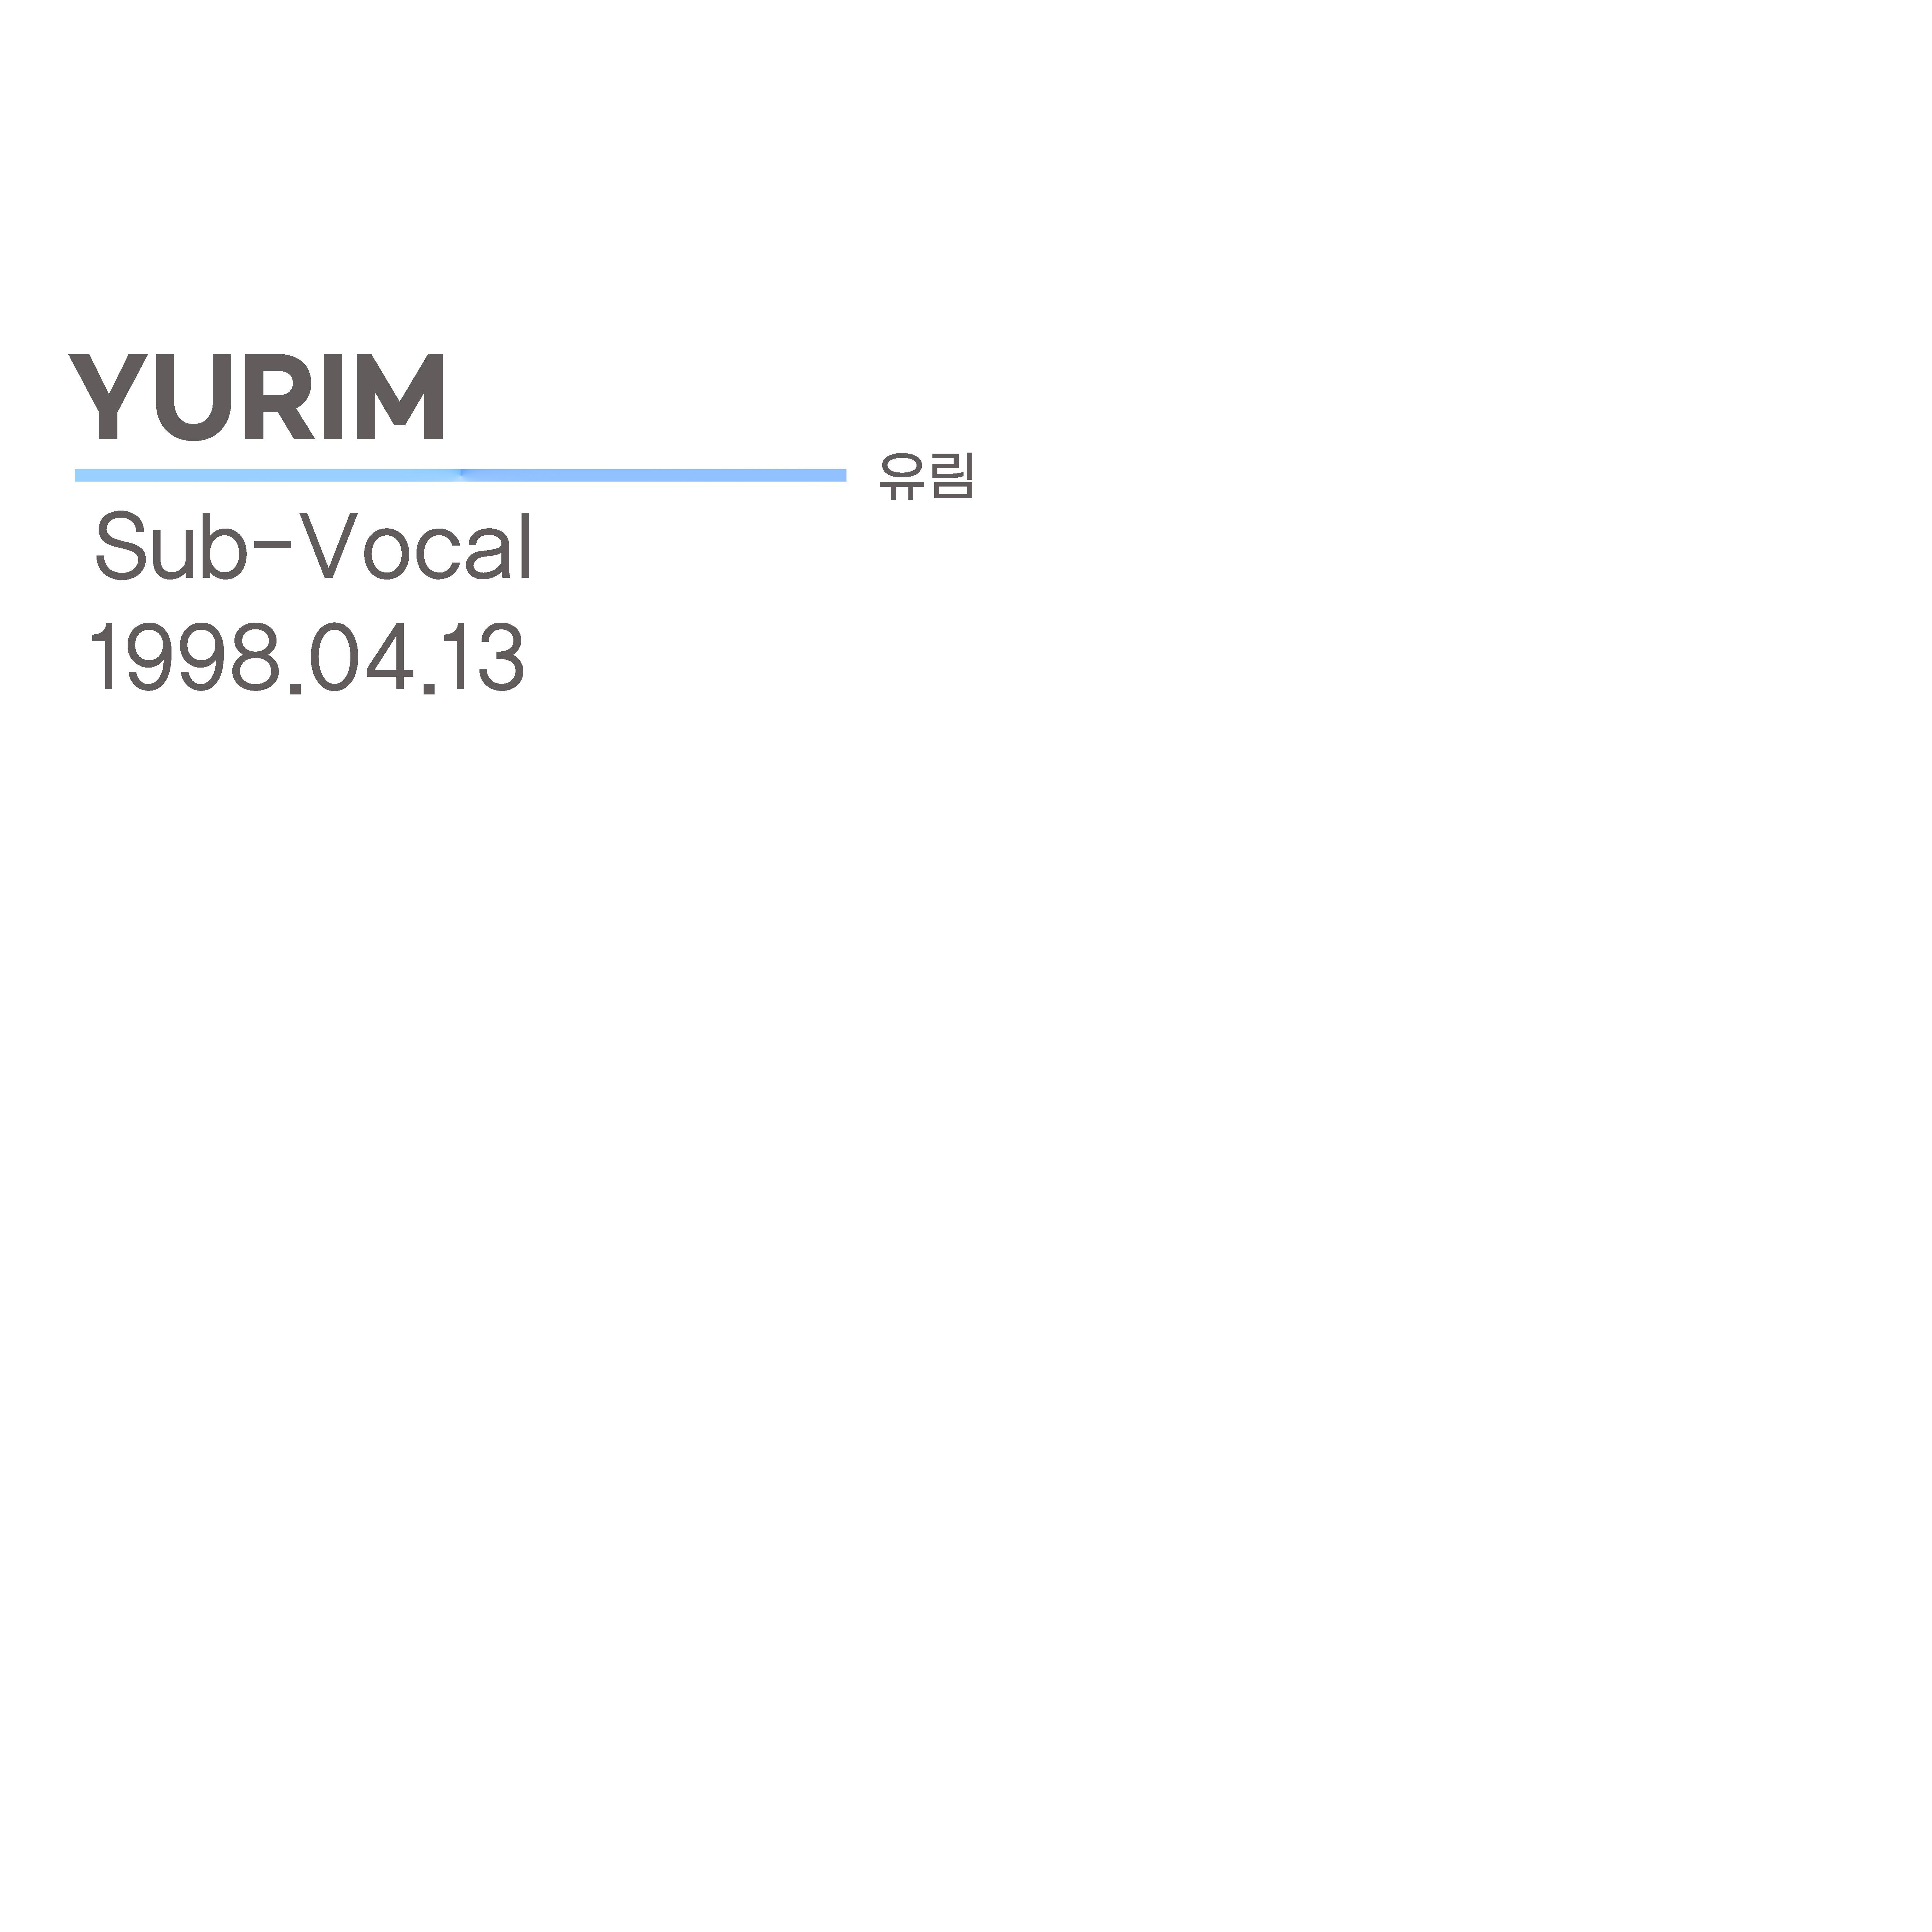 YURIM-PROFILE